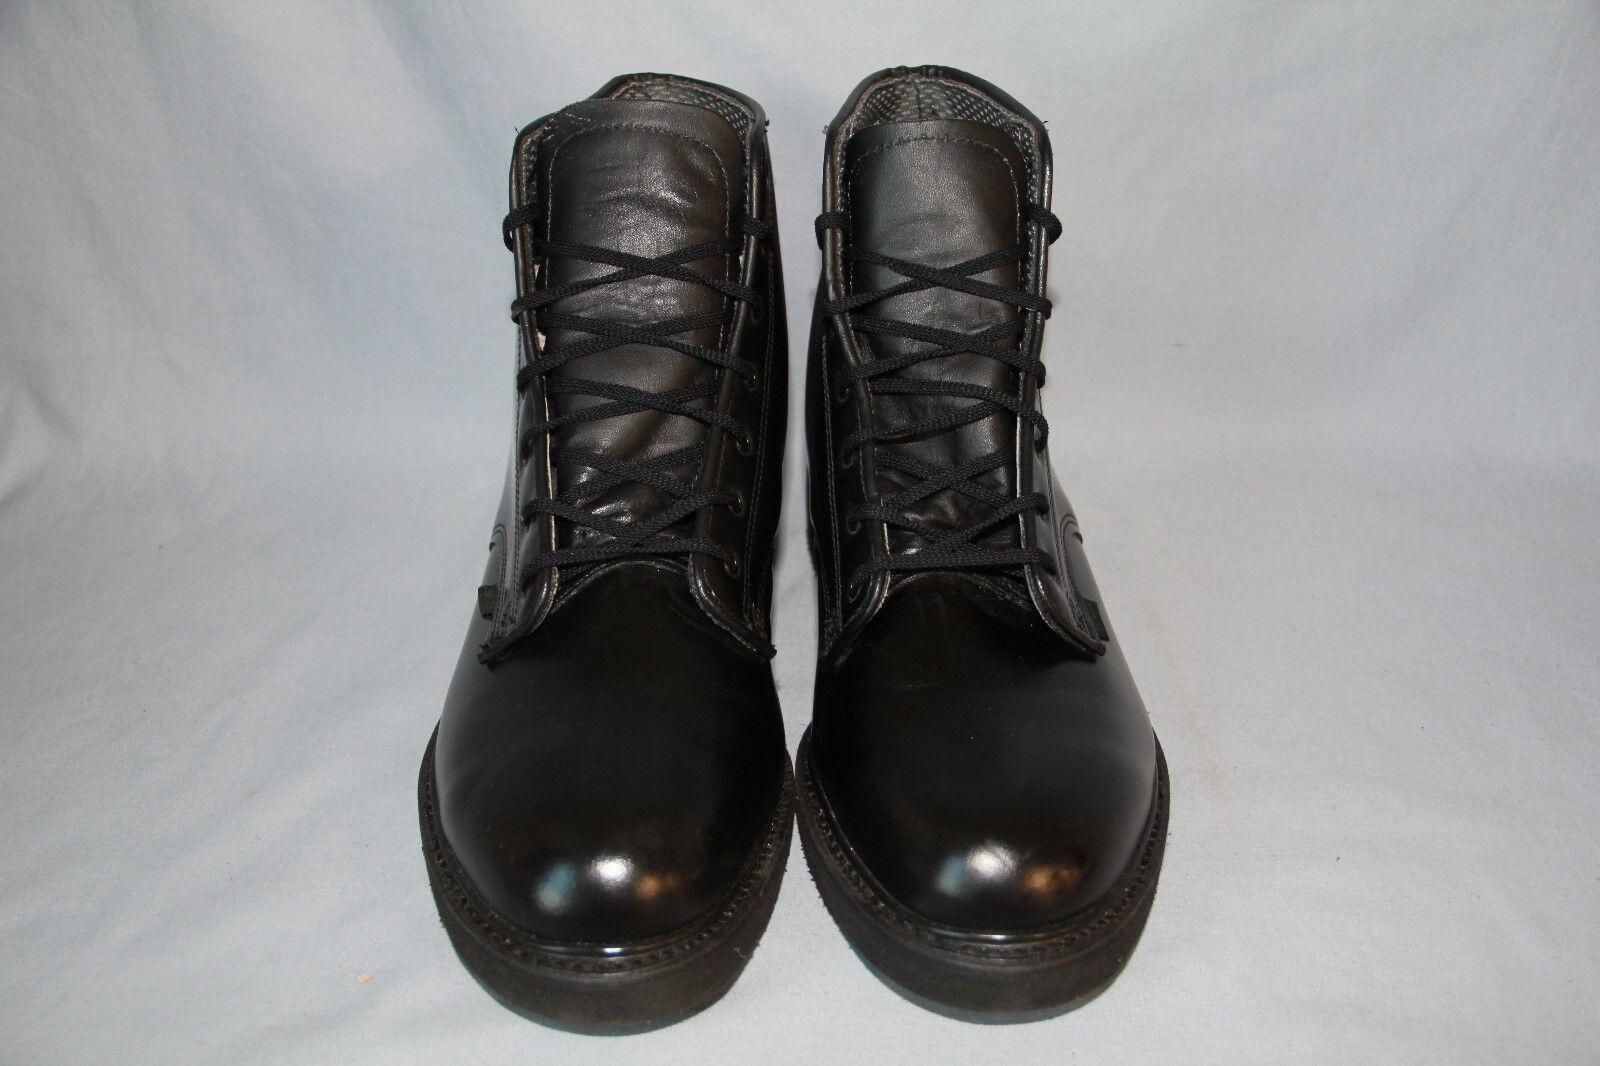 Men's Bates 6'' Black SR58 Plain Toe Postal Uniform Boots size. 10.5D  (342)